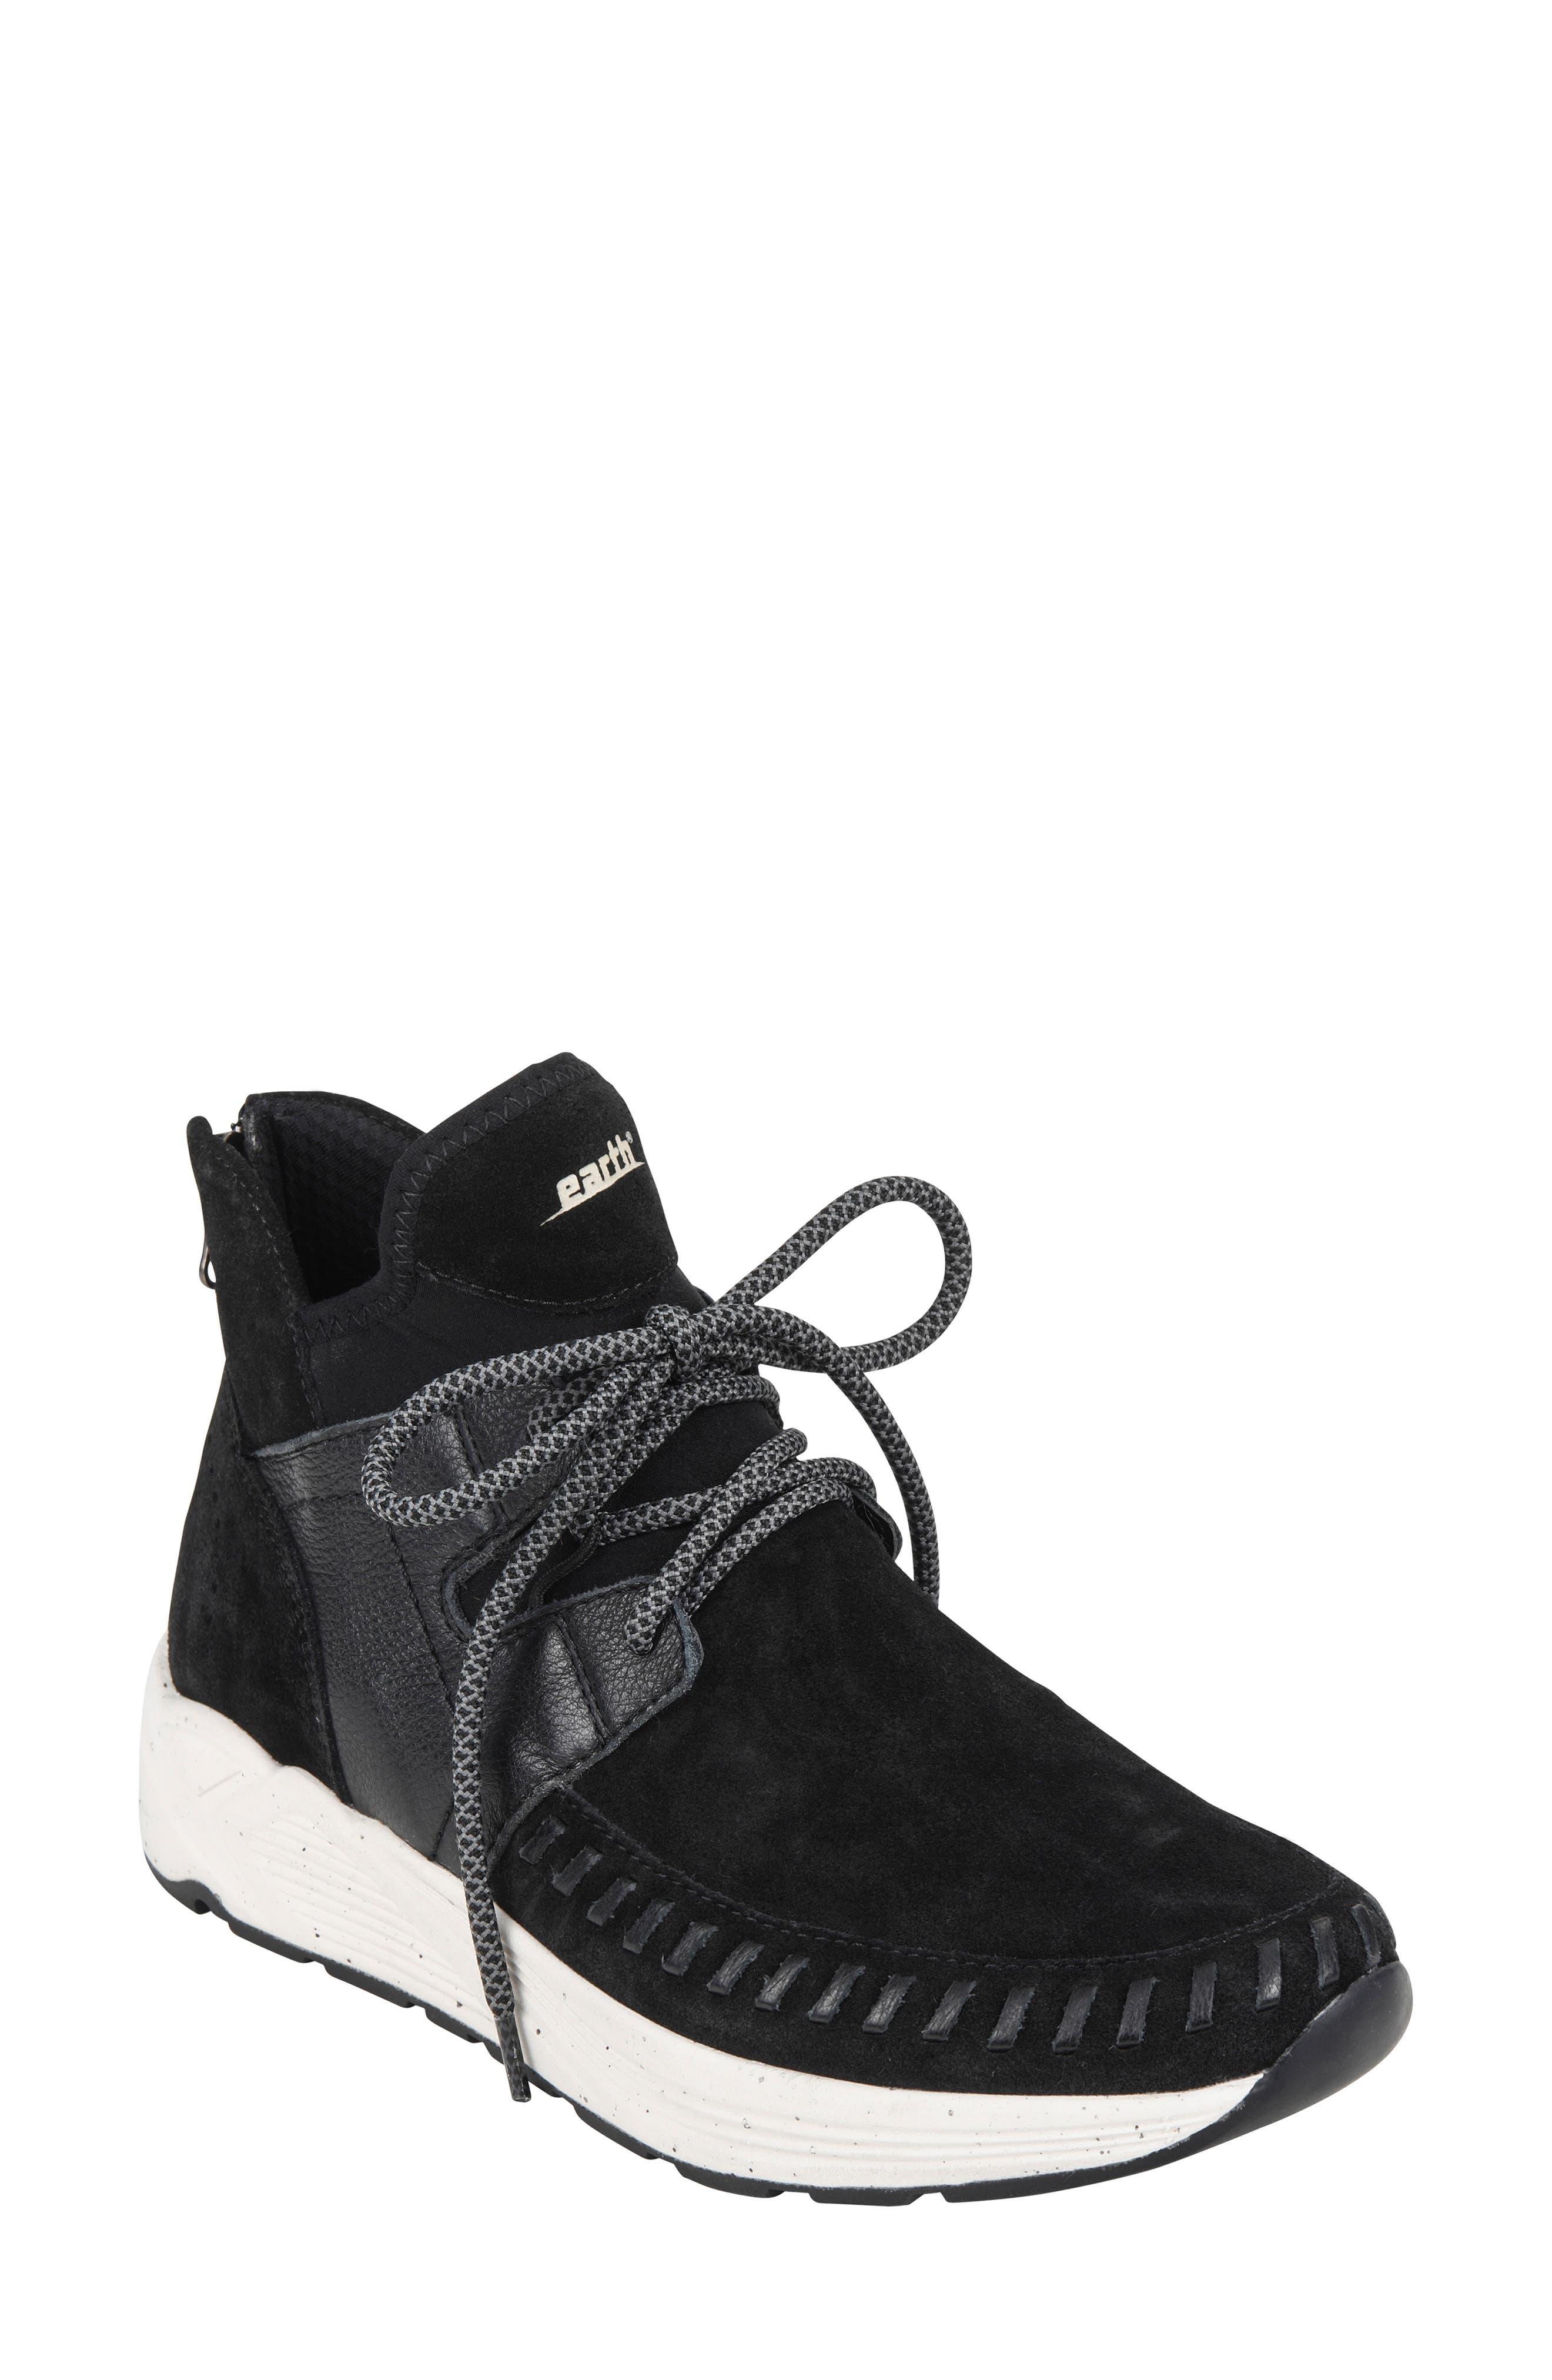 Earth Jaunt Sneaker, Black